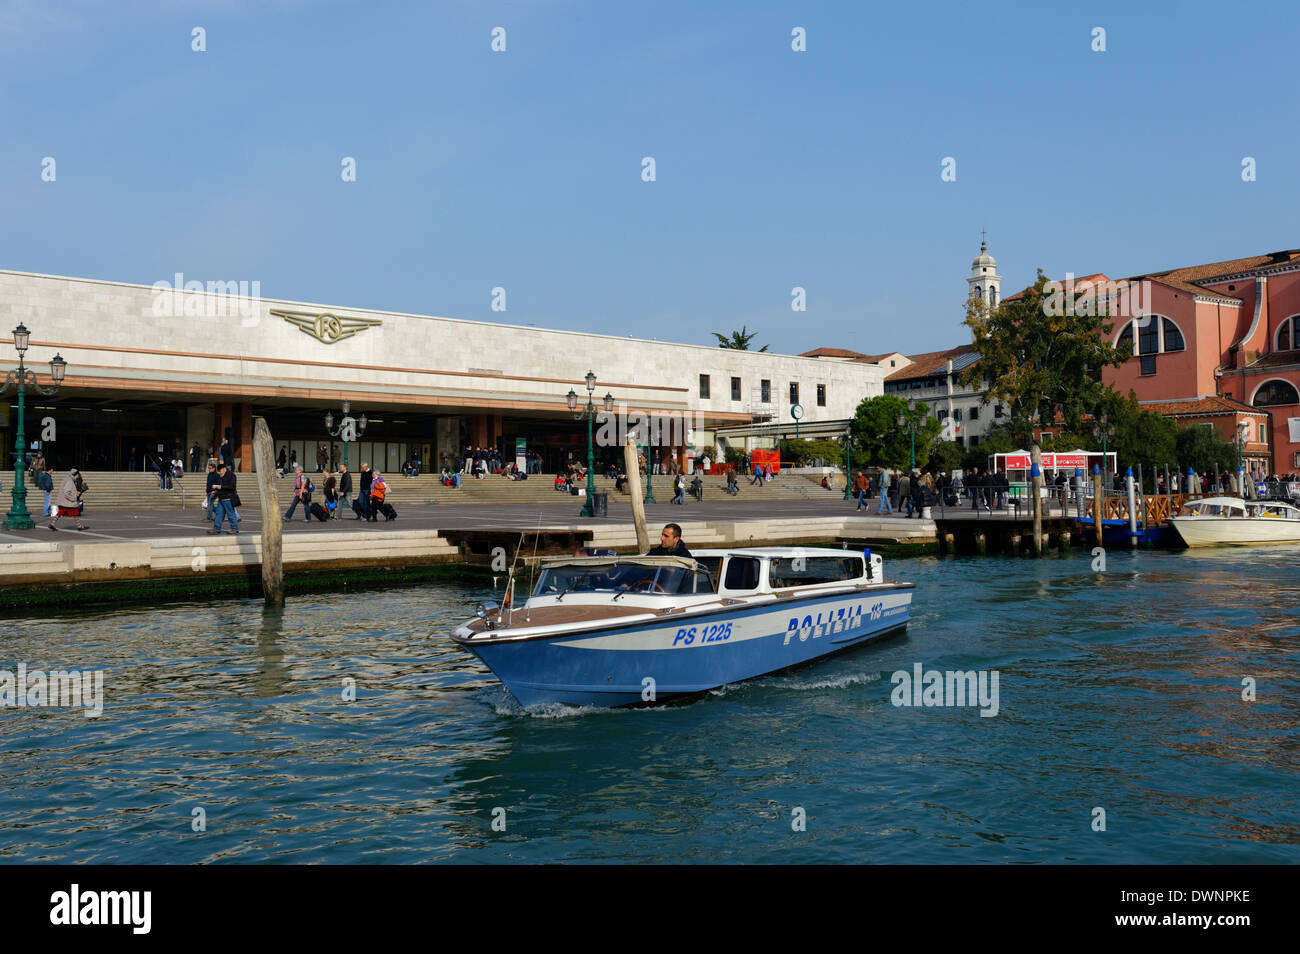 Police boat in front of the Santa Lucia train station, Cannaregio, Venice, Veneto, Italy - Stock Image